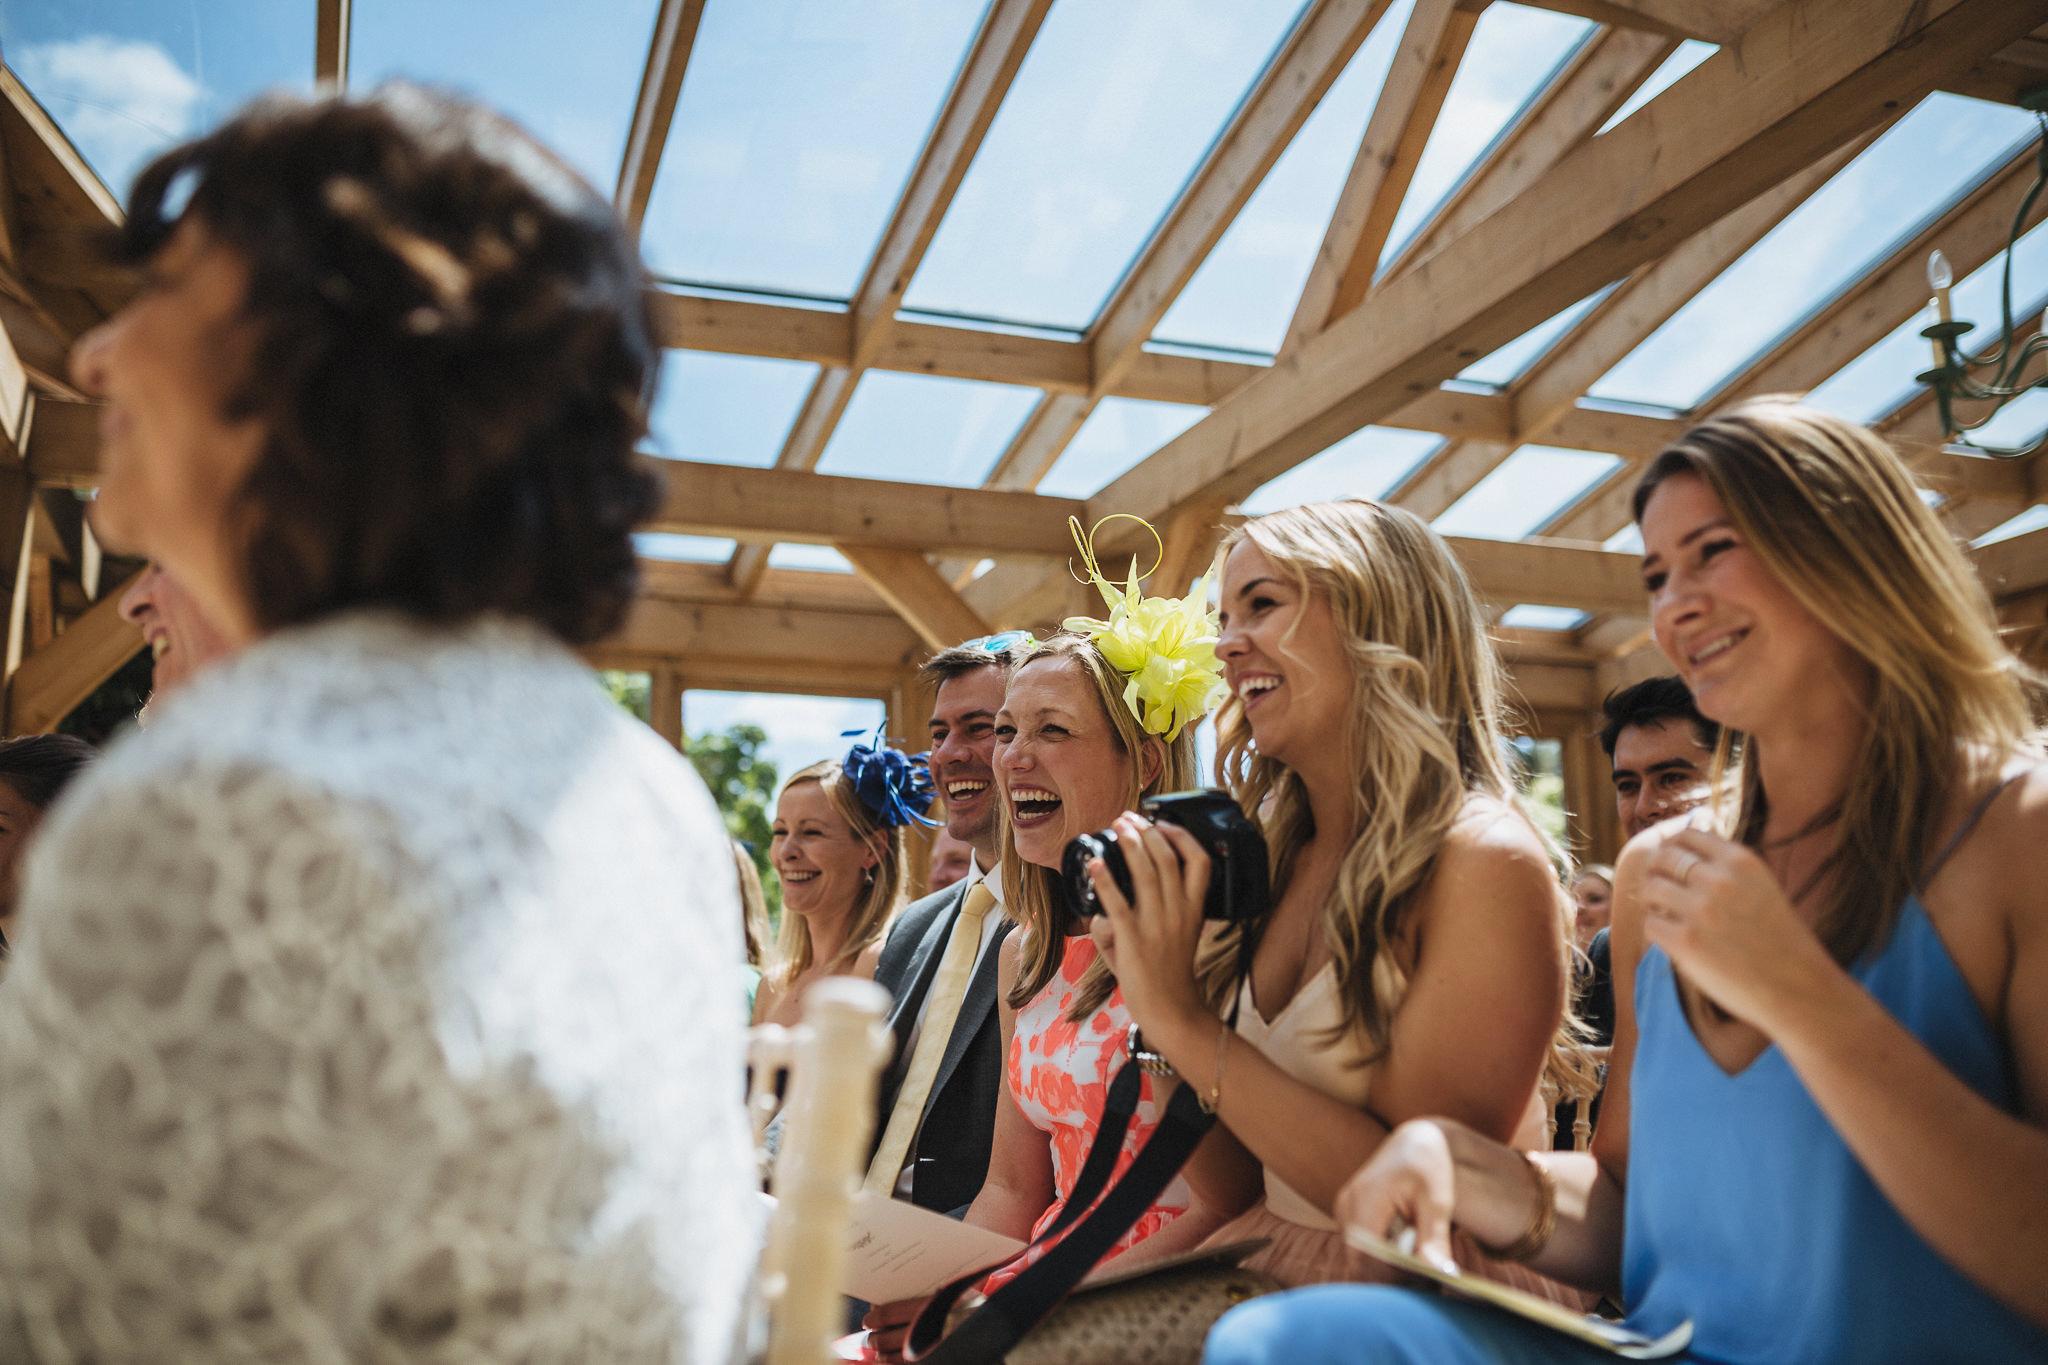 paul-marbrook-Gaynes-Park Wedding-Photographer-90047